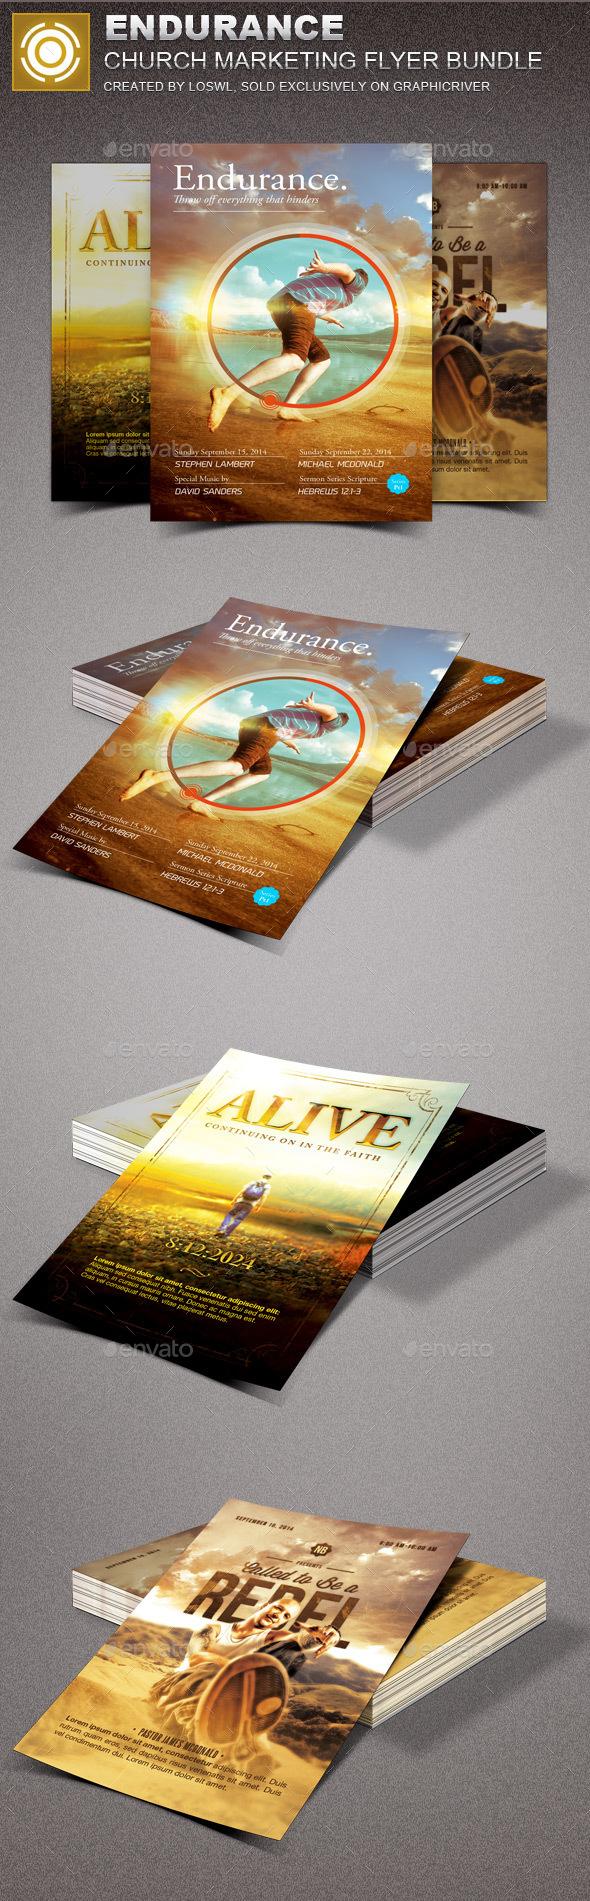 Endurance Church Marketing Flyer Template Bundle - Church Flyers